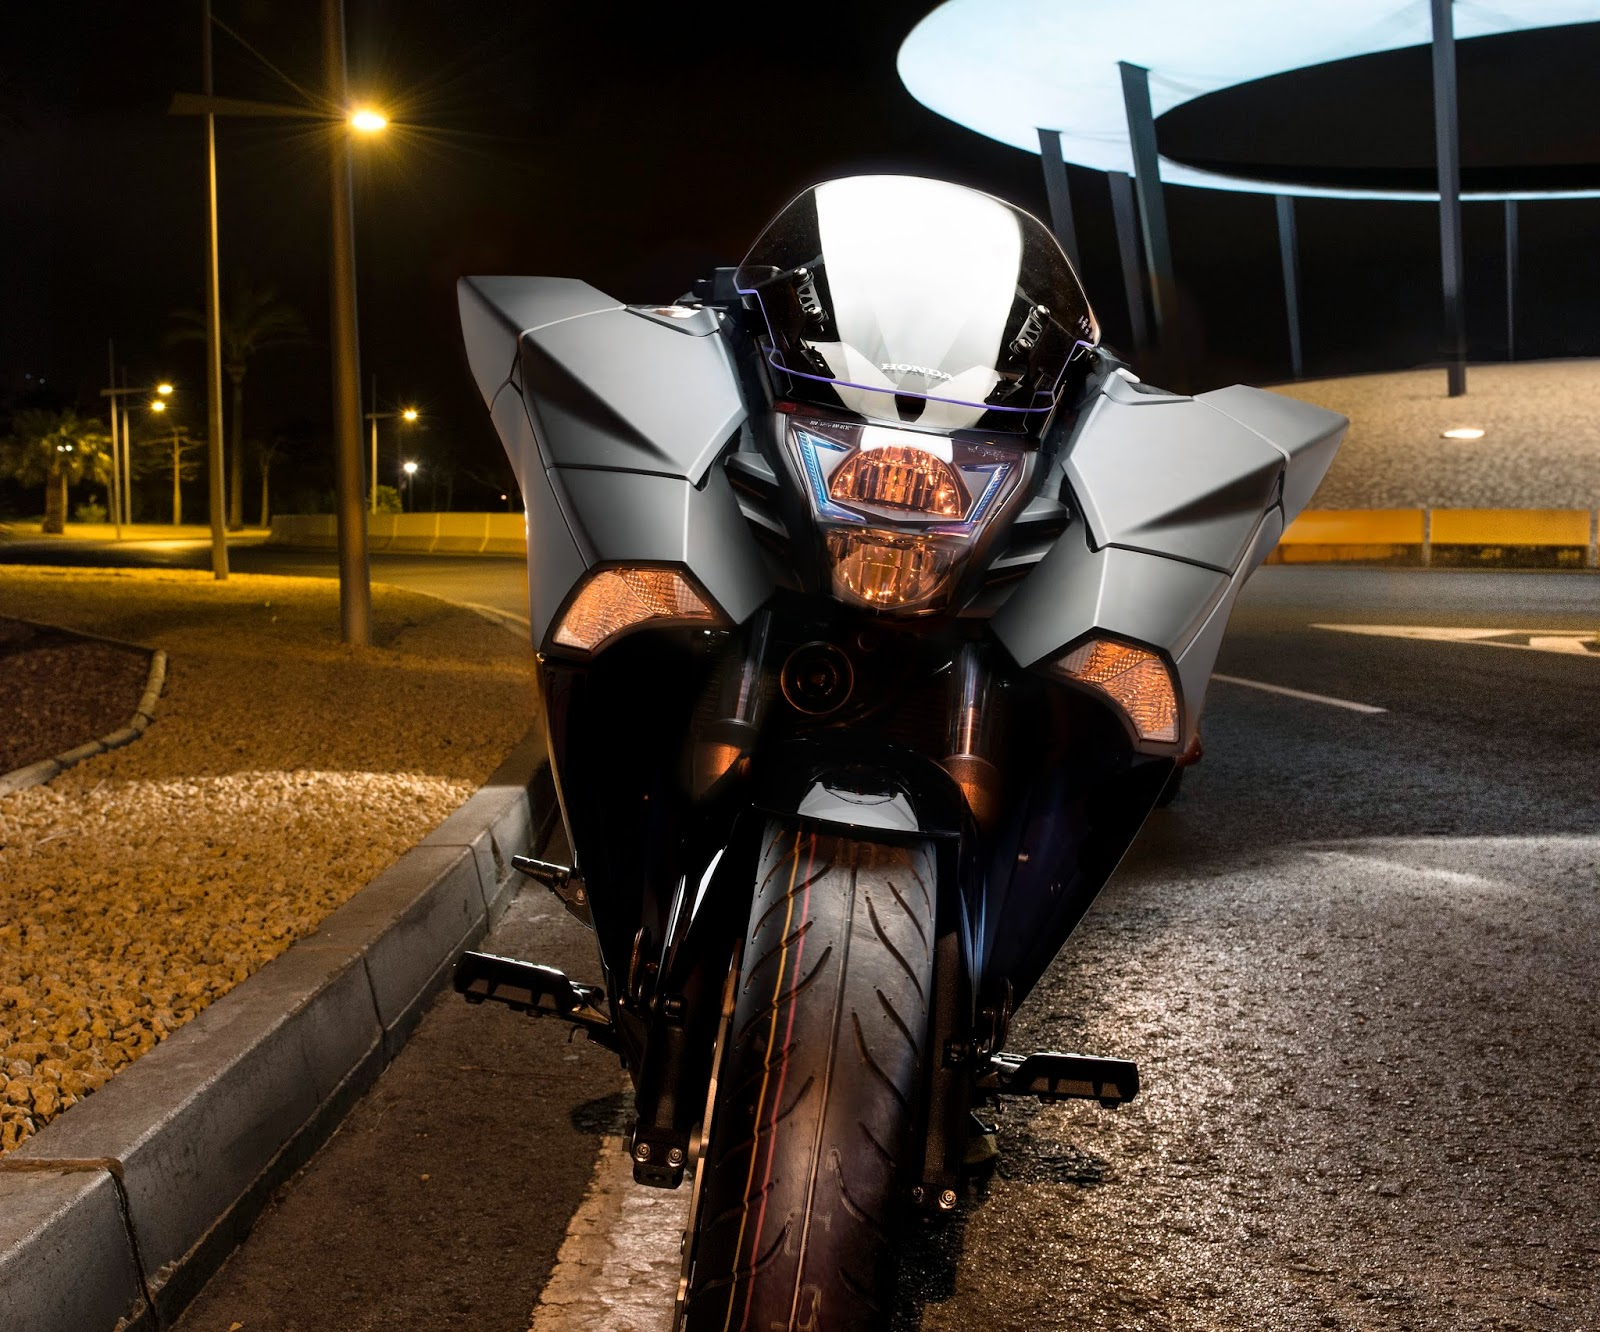 Honda NM4 Vultus Makes Debut Appearance at London Comic Con